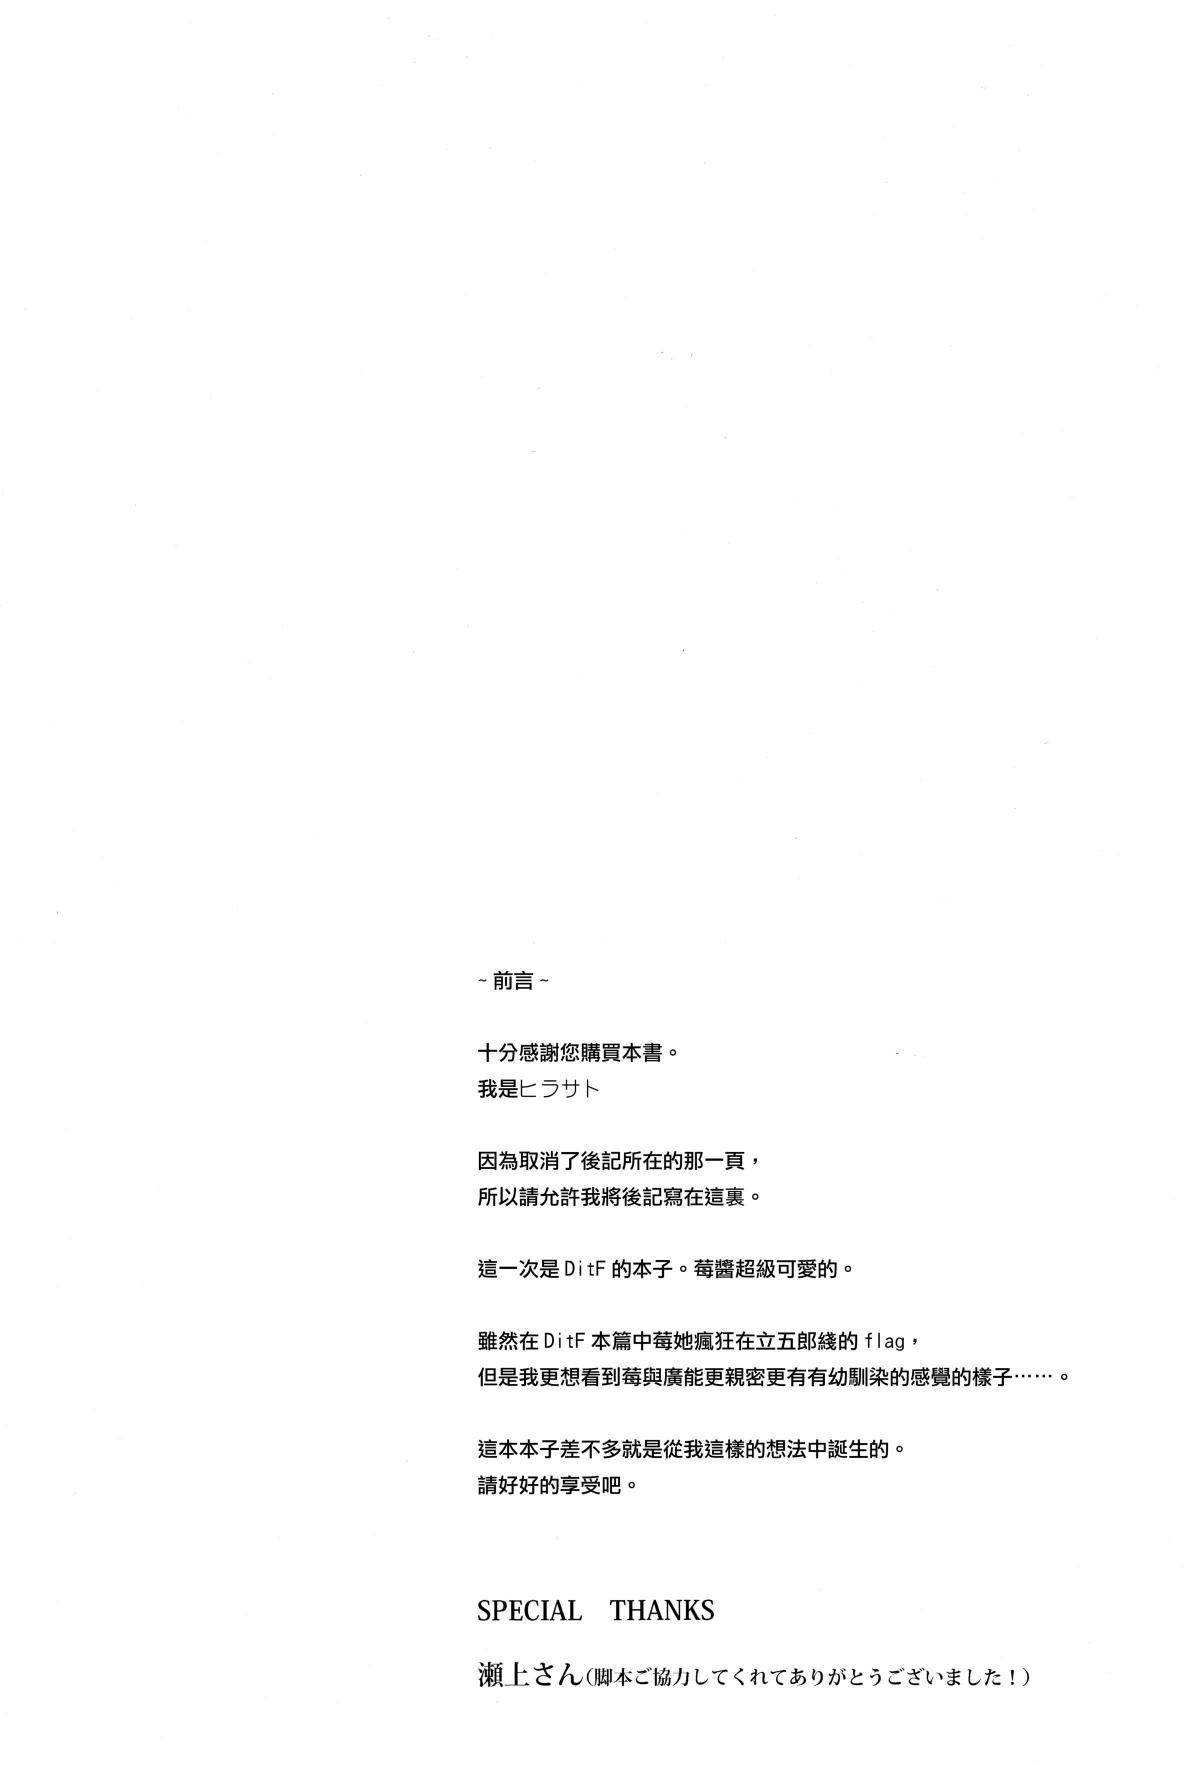 Hình ảnh  trong bài viết Truyện hentai Kodomo No Tsukurikata